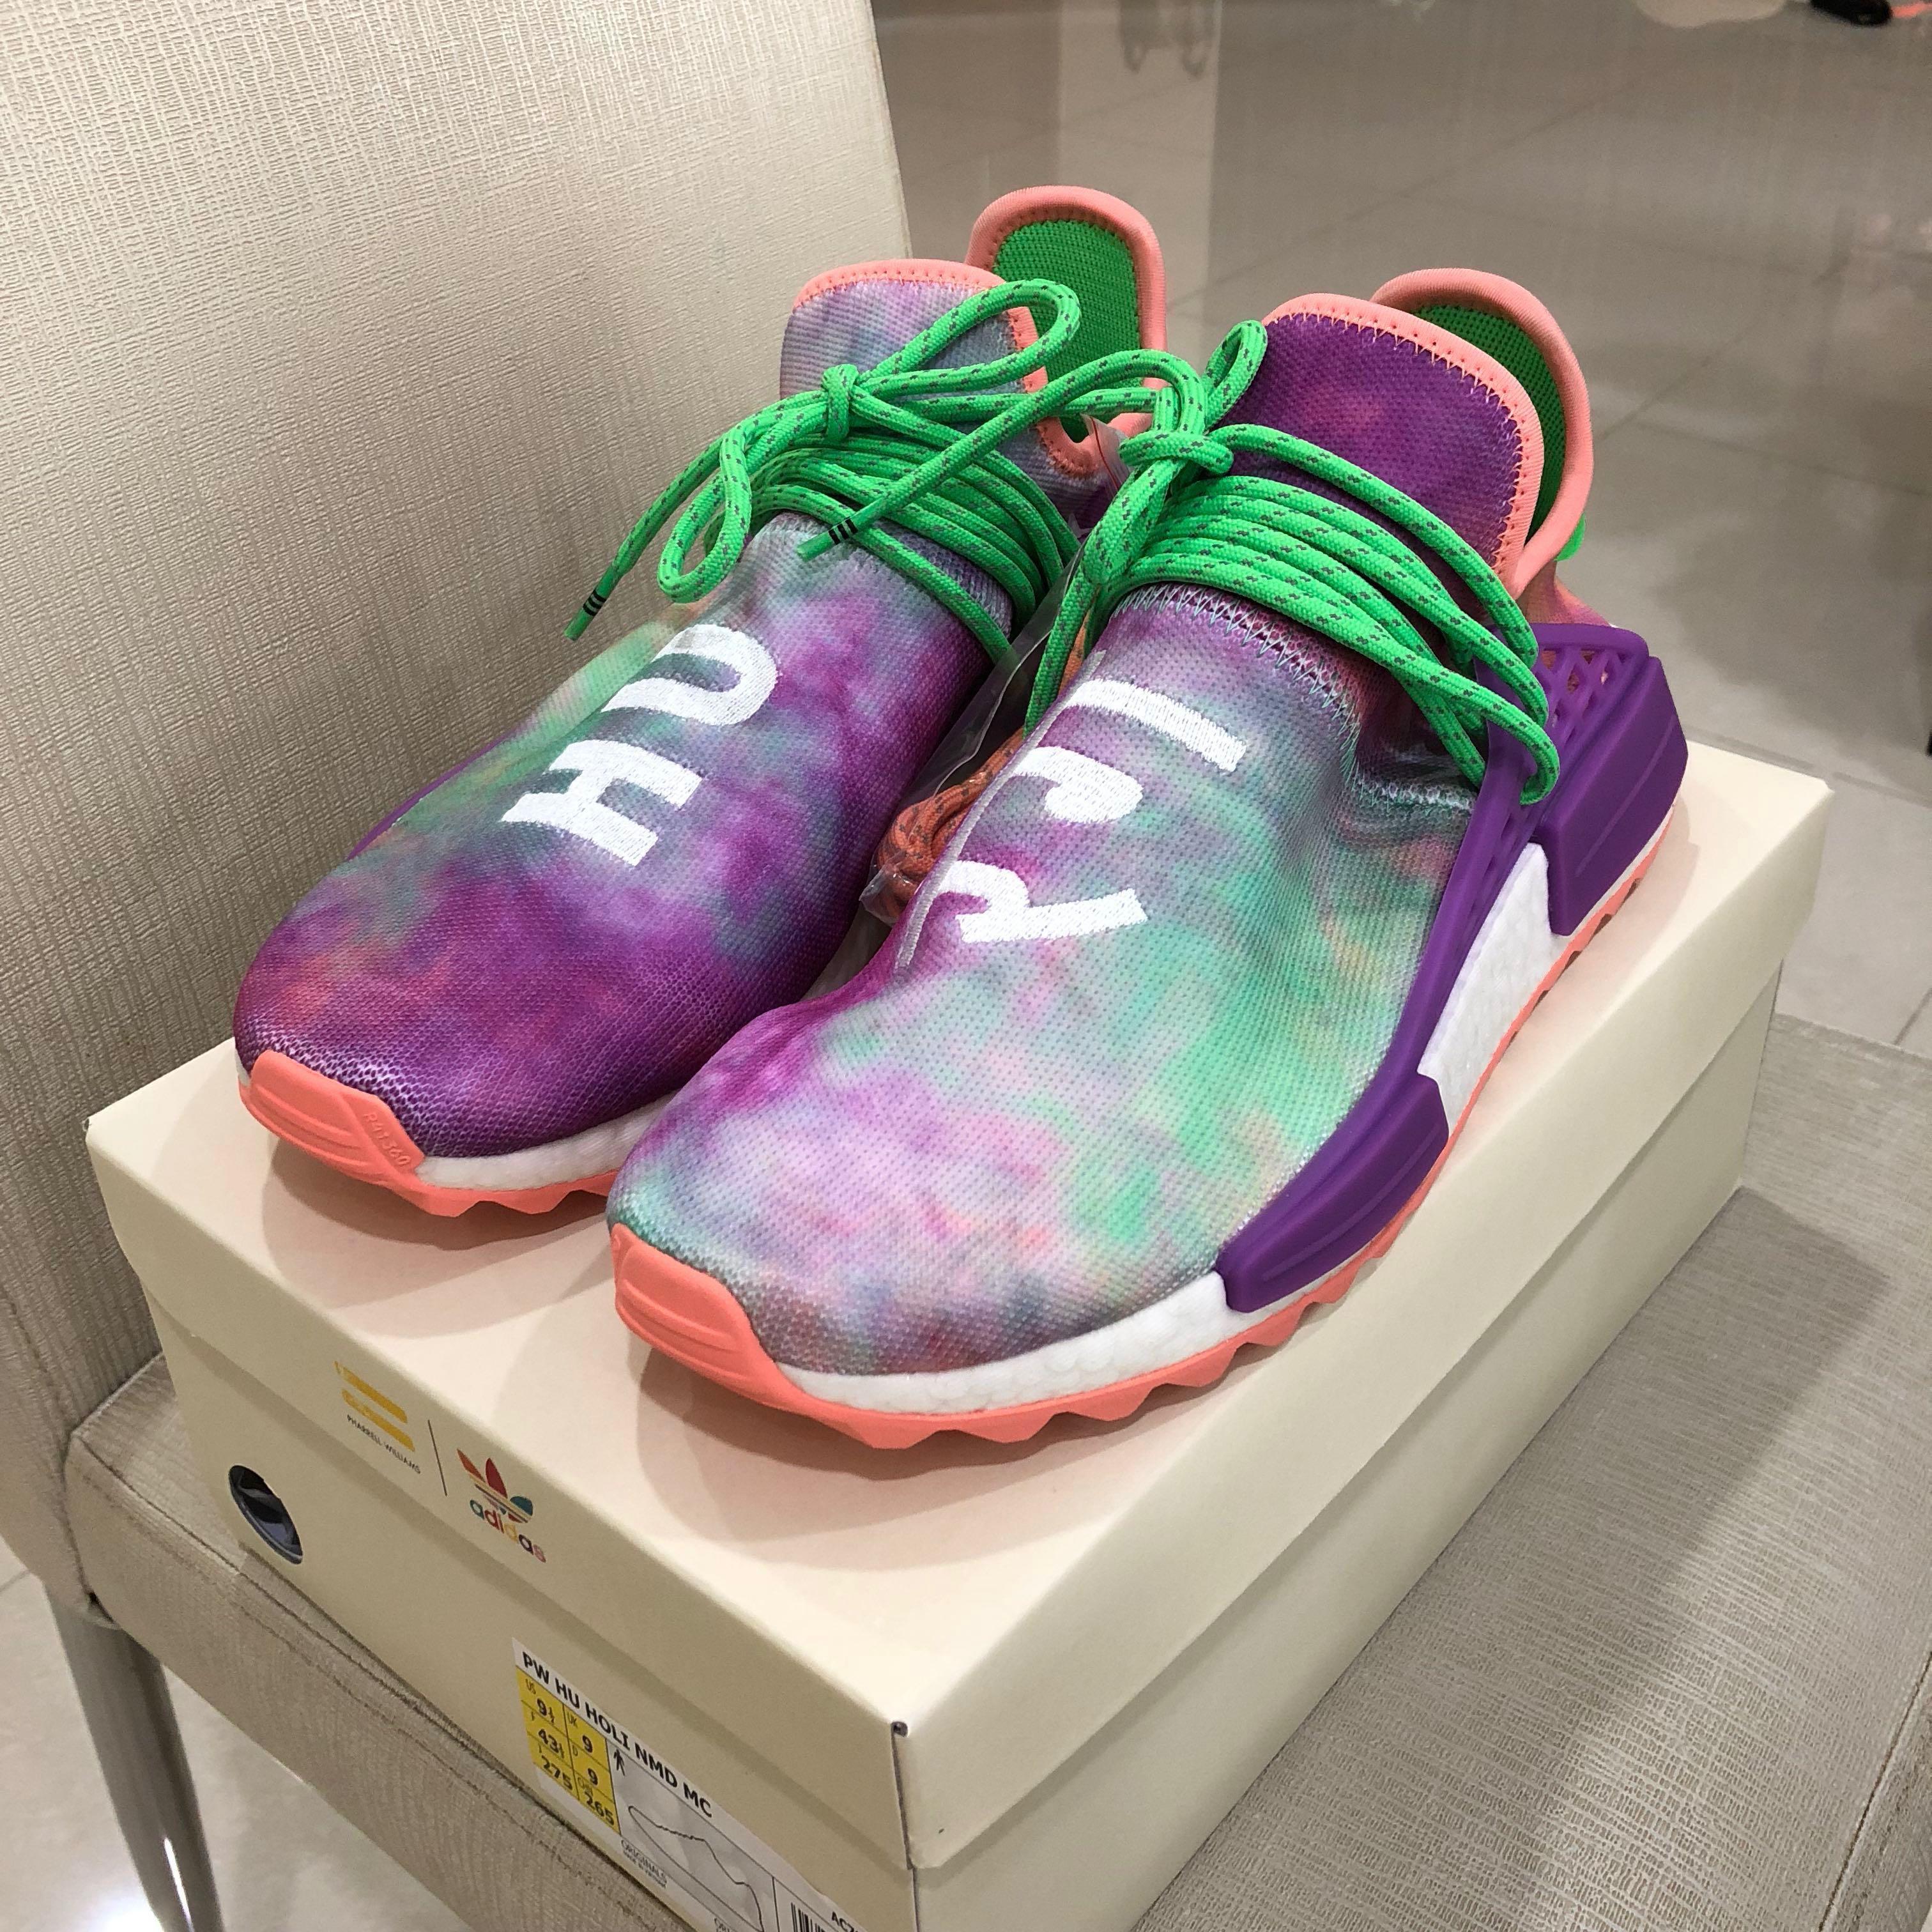 356446f1160587 Home · Men s Fashion · Footwear · Sneakers. photo photo photo